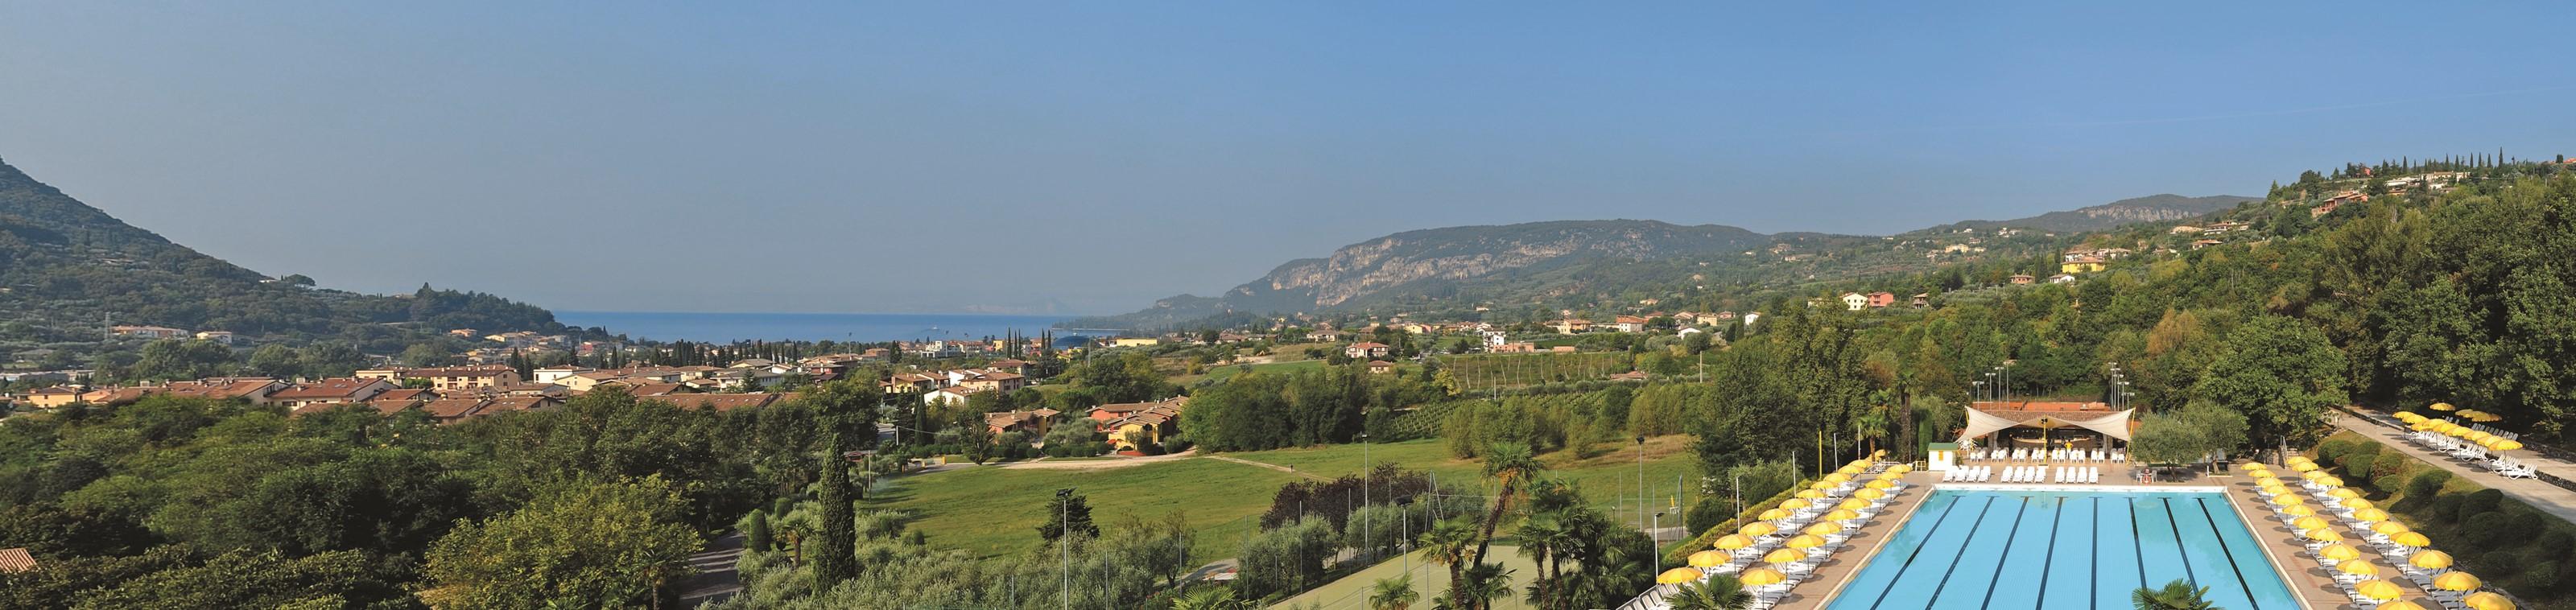 Roadtrippen in Italië vanuit Poiano Resort Hotel ****